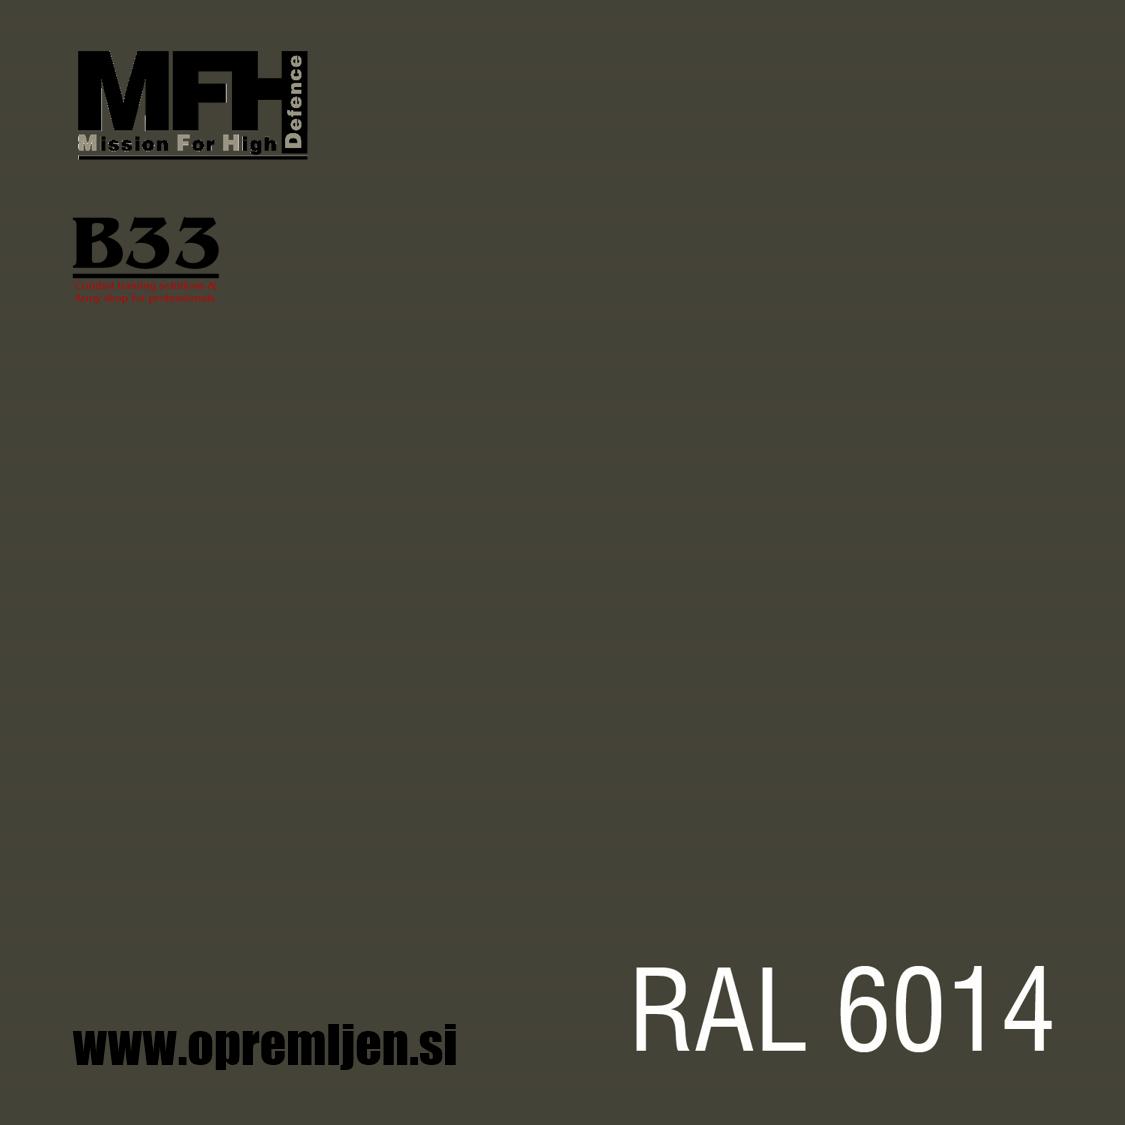 Vojaška barva sprej olivna OLIV DRAB RAL6014 400ml MFH - Max Fuchs by B33 army shop at www.opremljen.s